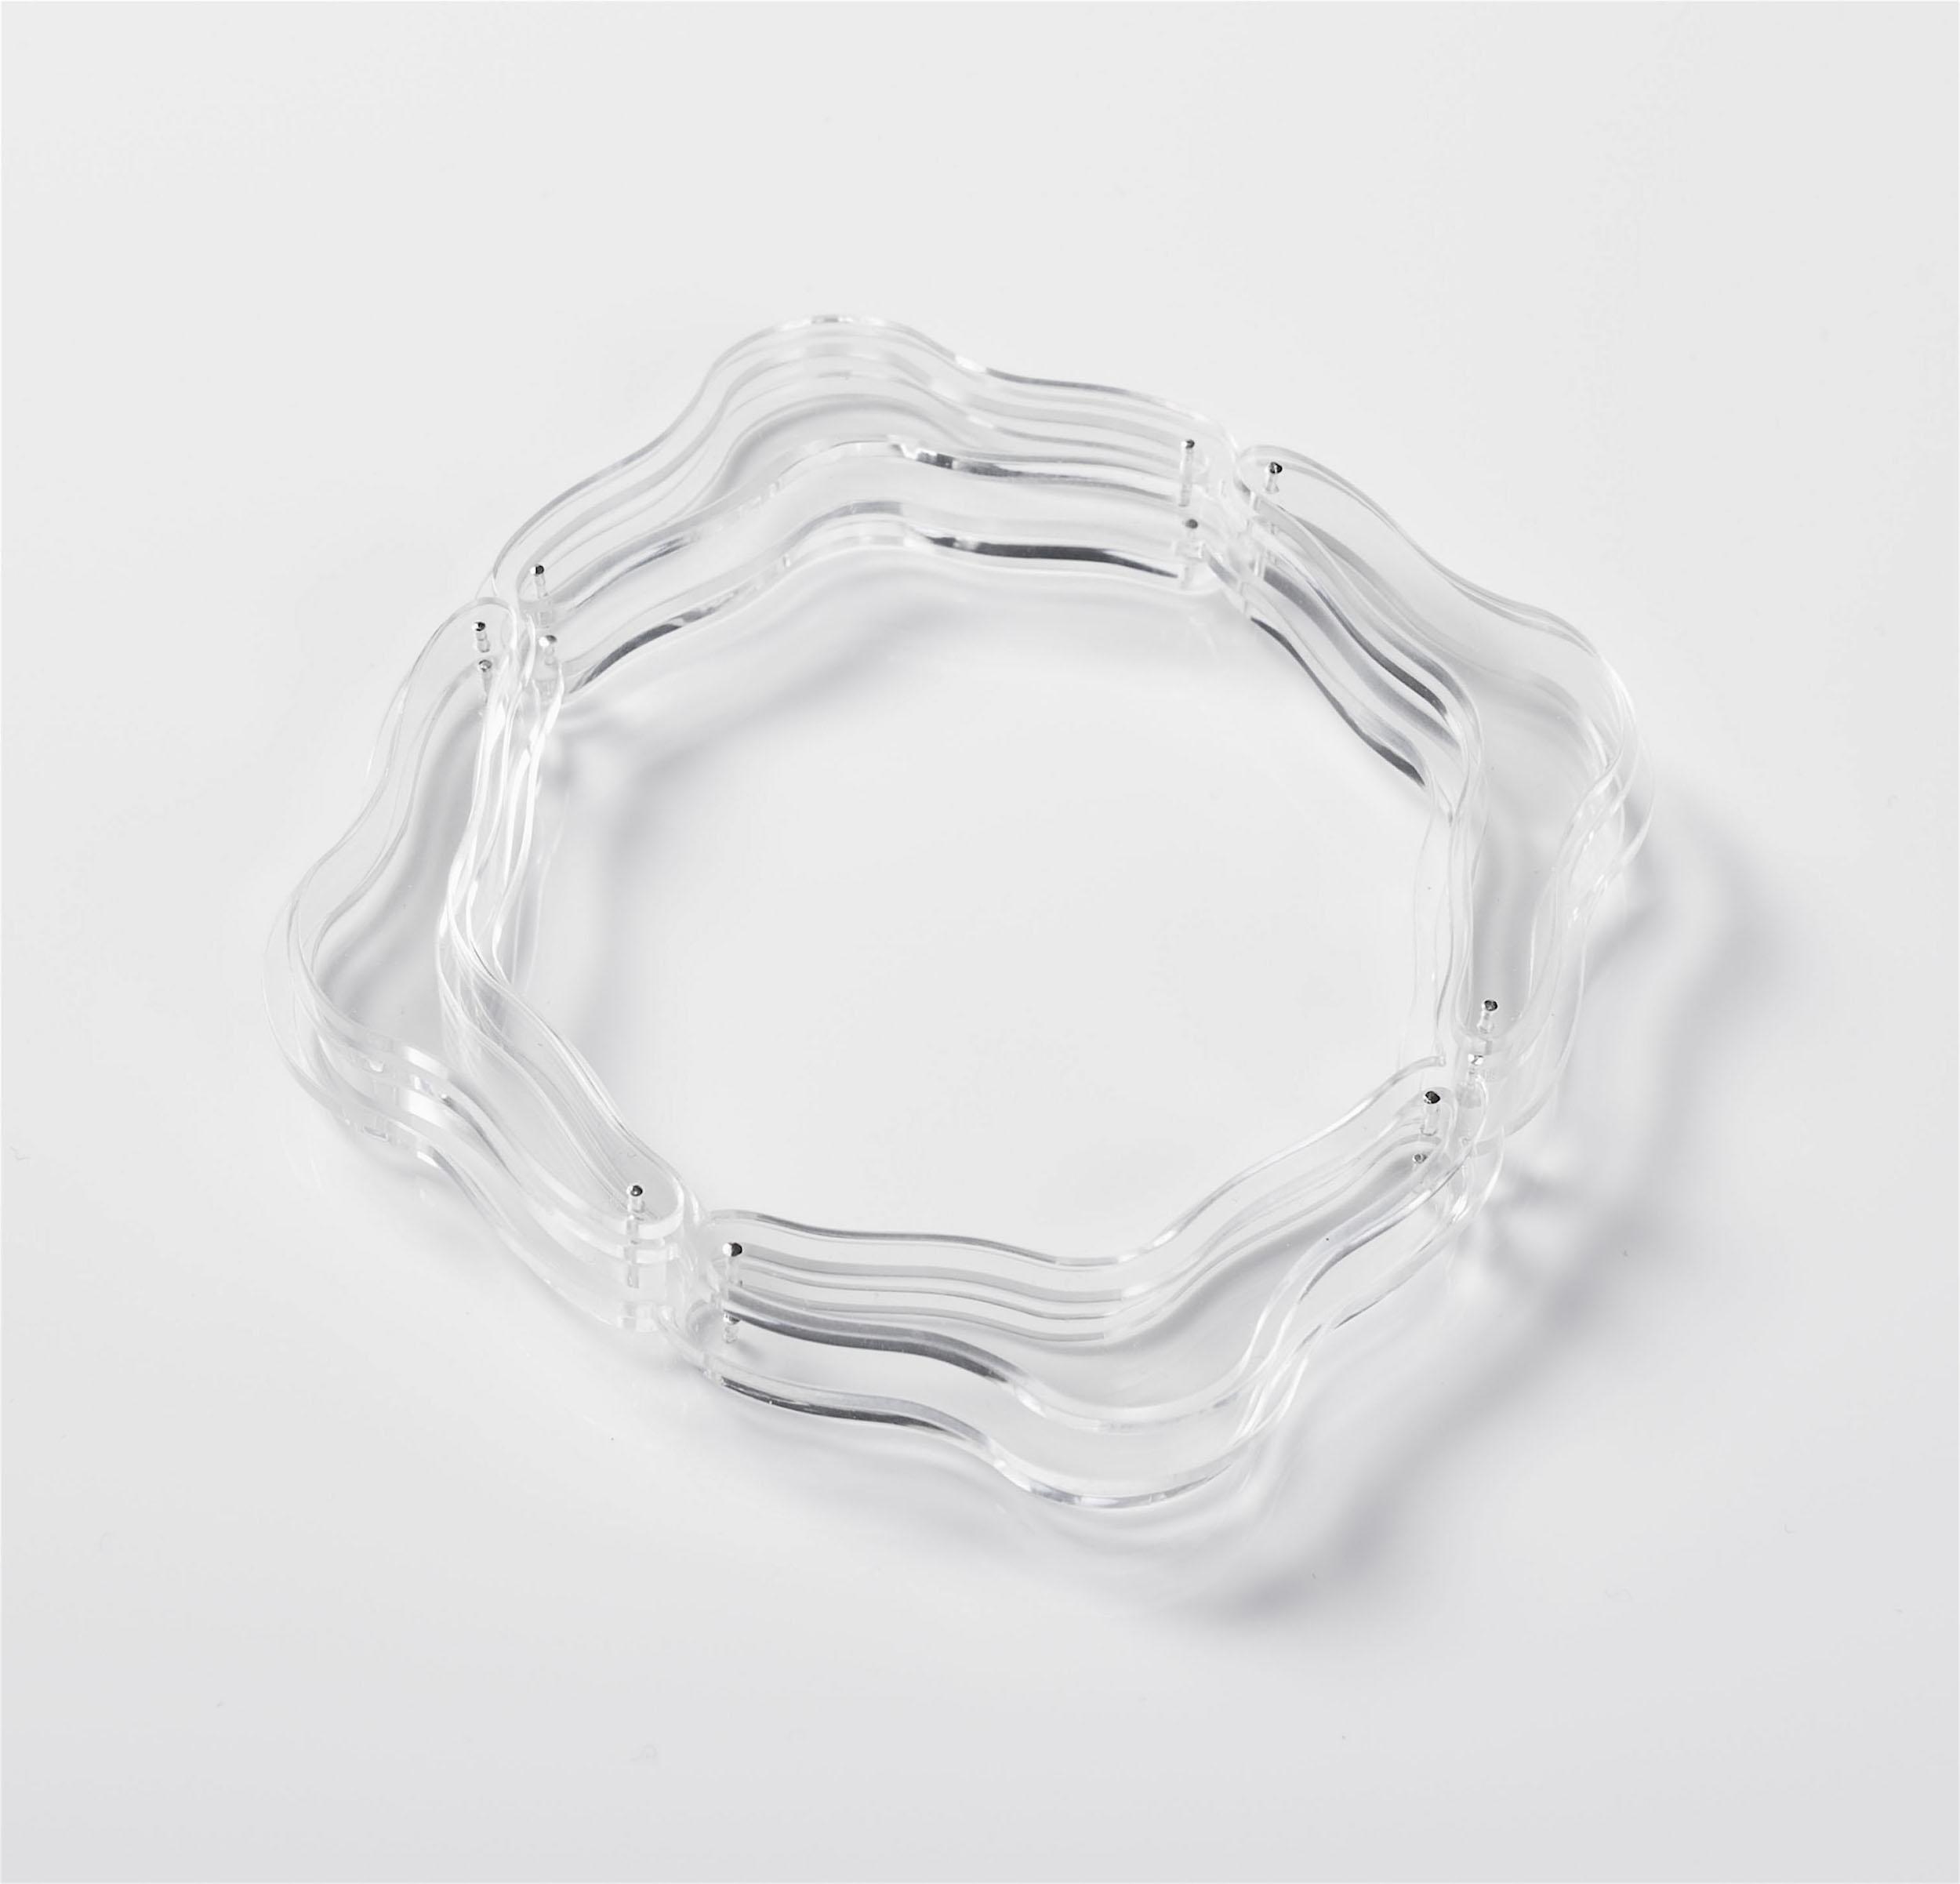 ghost jewellery stacked bracelet silver clear acrylic.jpg